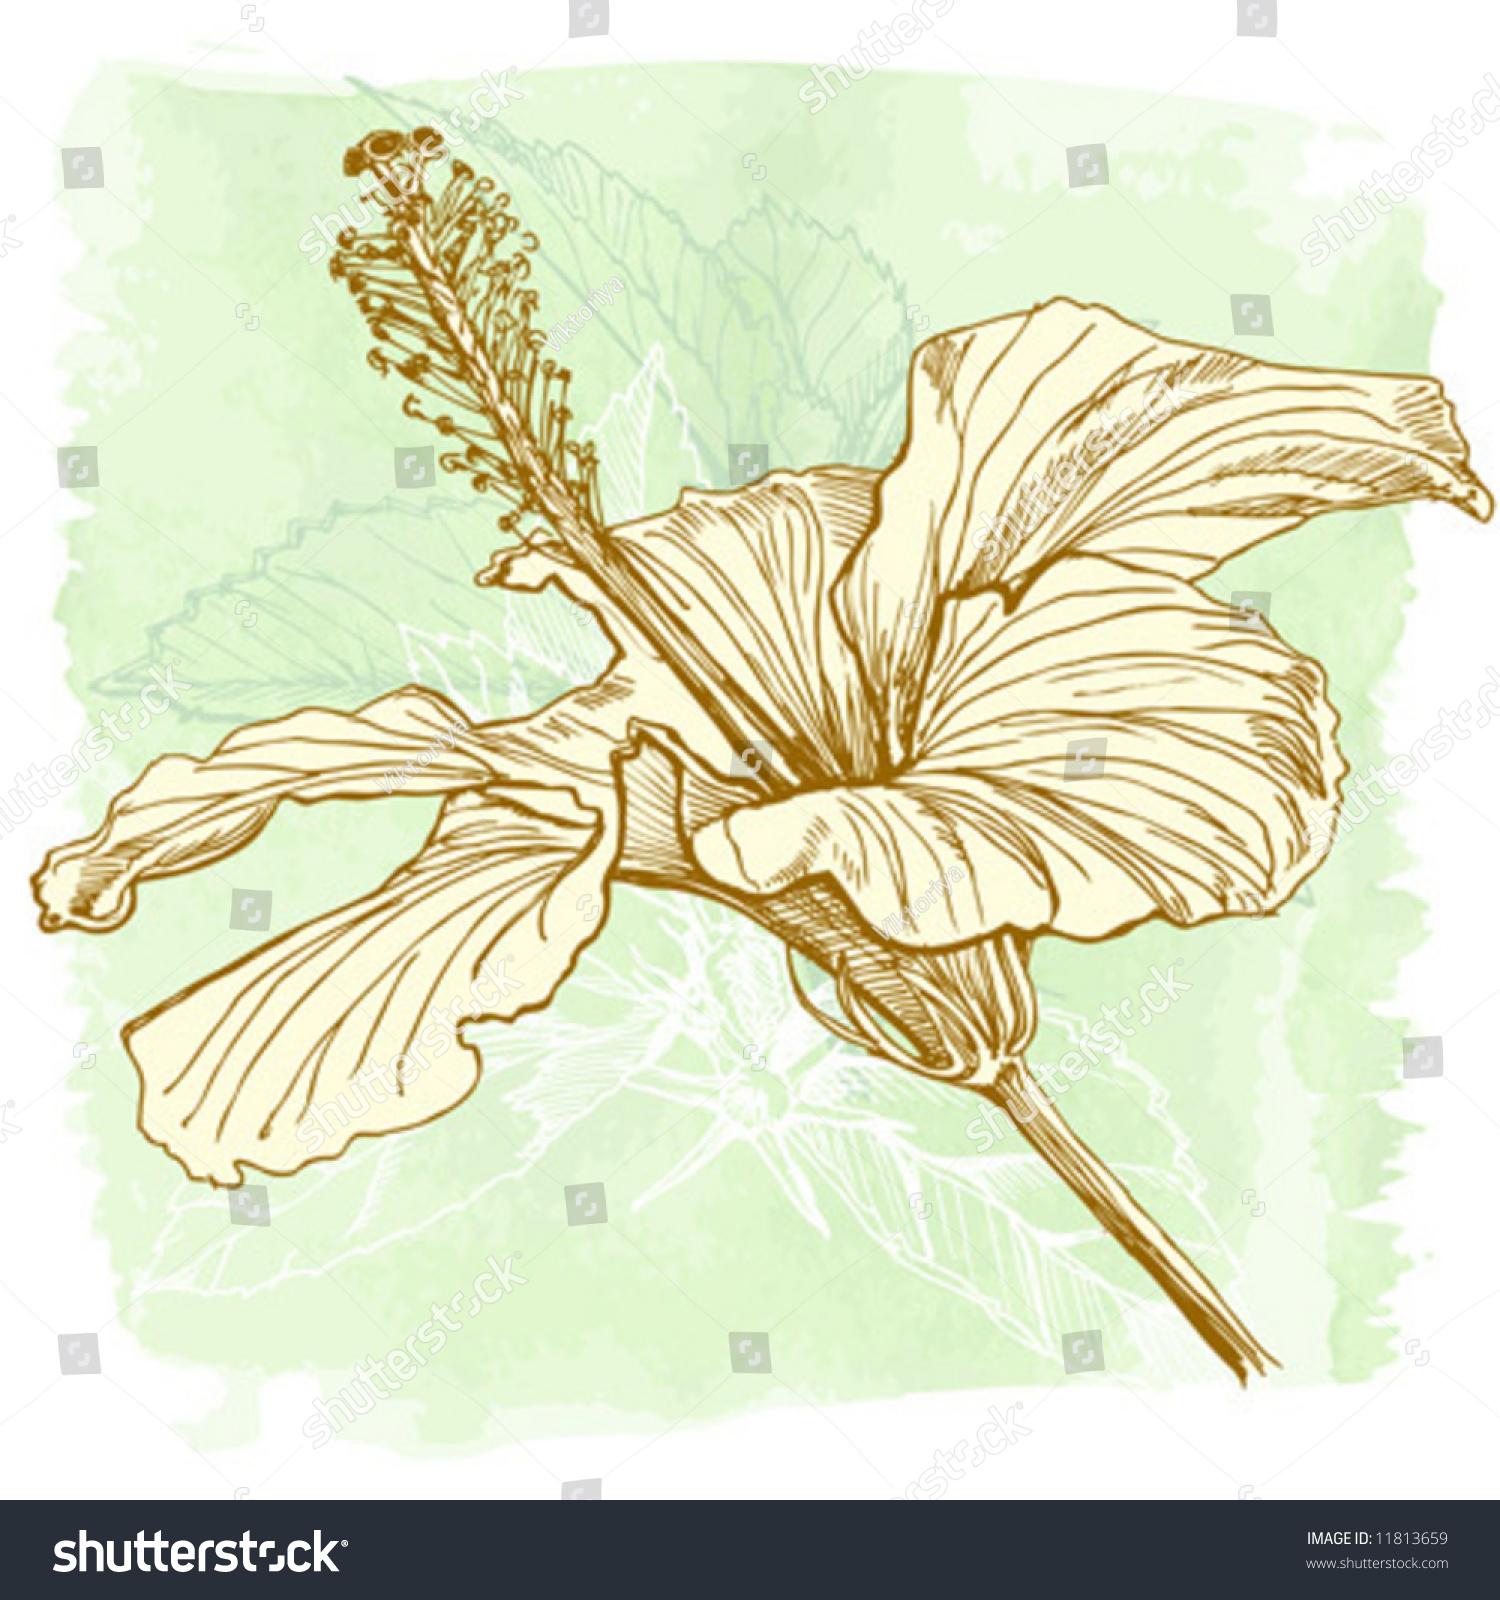 Hibiscus flower vector hand draw stock vector 2018 11813659 hibiscus flower vector hand draw izmirmasajfo Choice Image